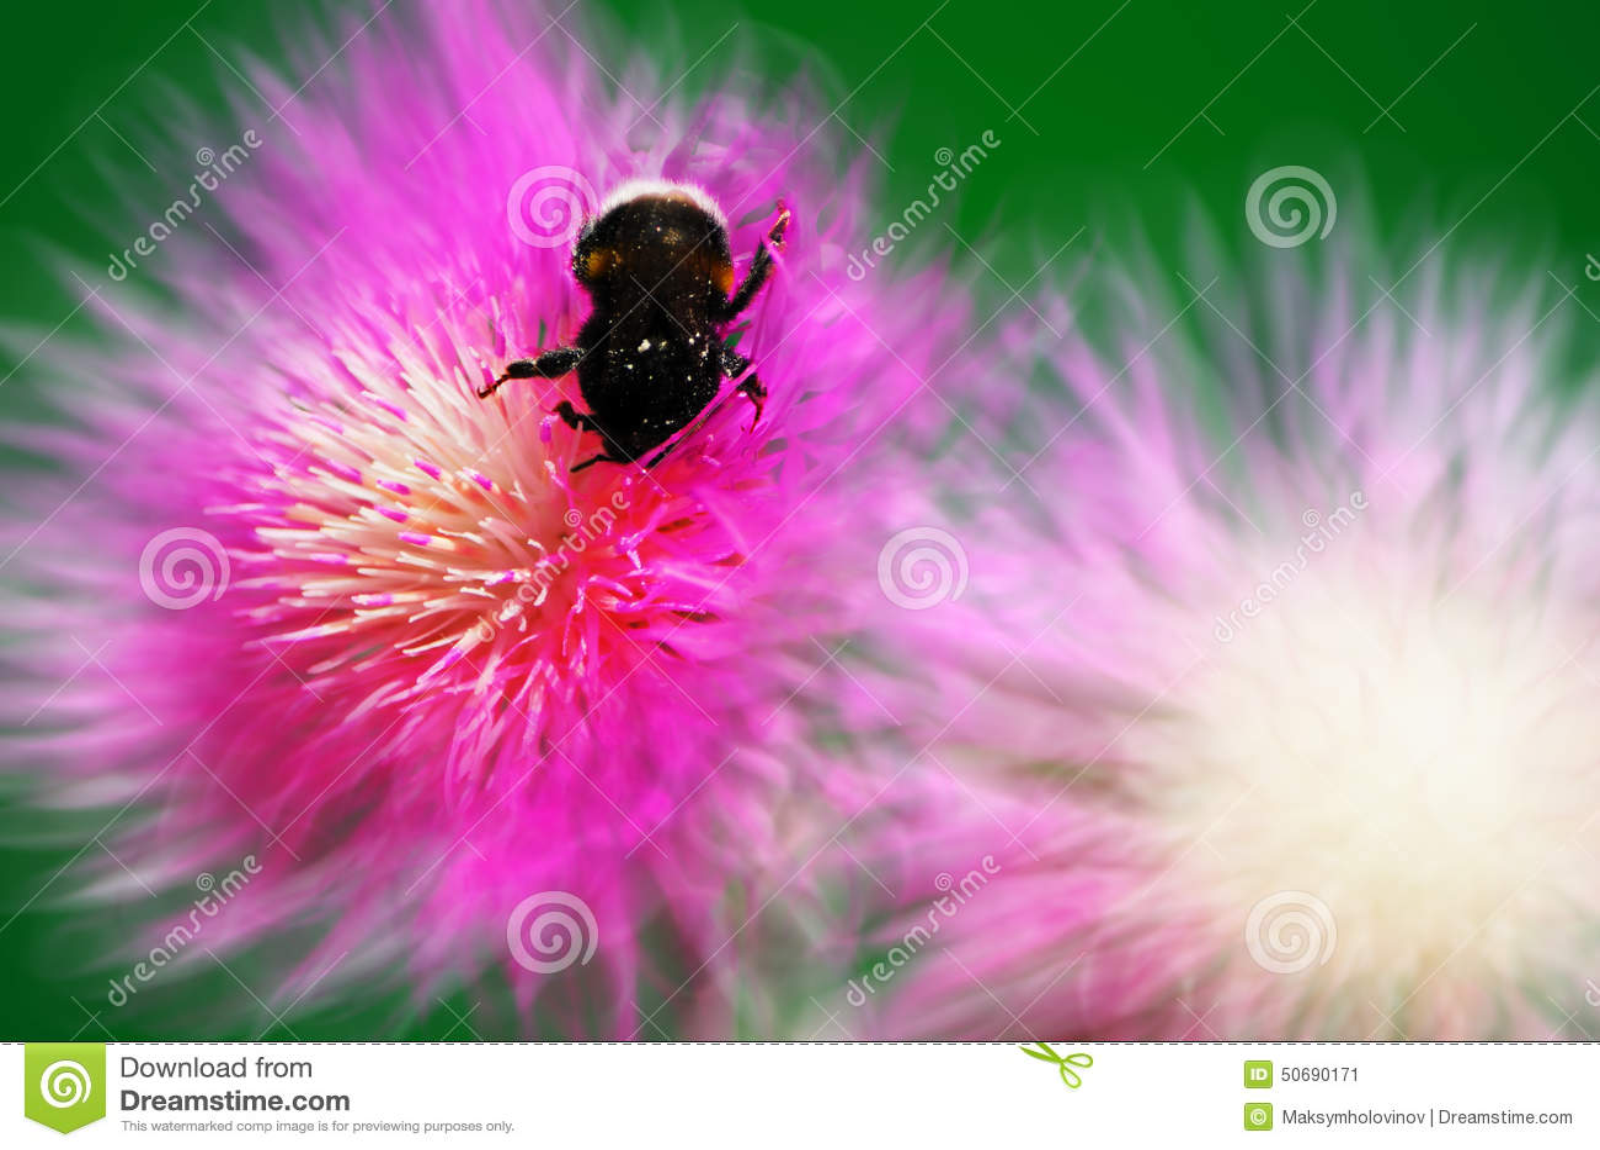 Download 在花矢车菊的土蜂 库存图片. 图片 包括有 没人, 户外, 生活, bossies, 装饰, 绿色, beautifuler - 50690171